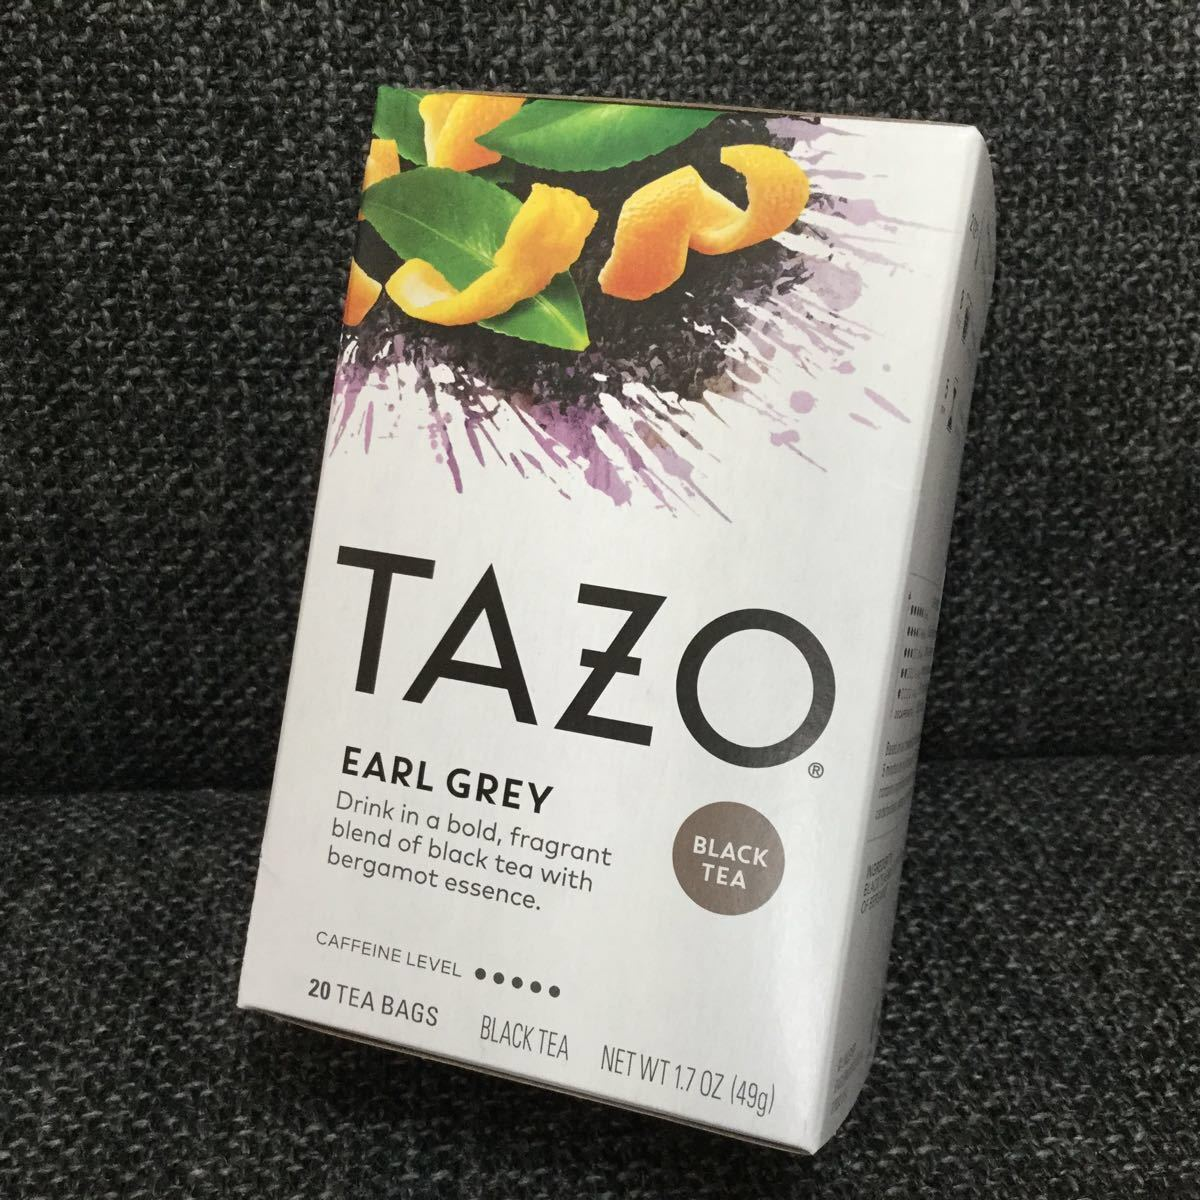 TAZO tea★タゾティー★アールグレイ★紅茶★スタバ★ラベンダーアールグレイ